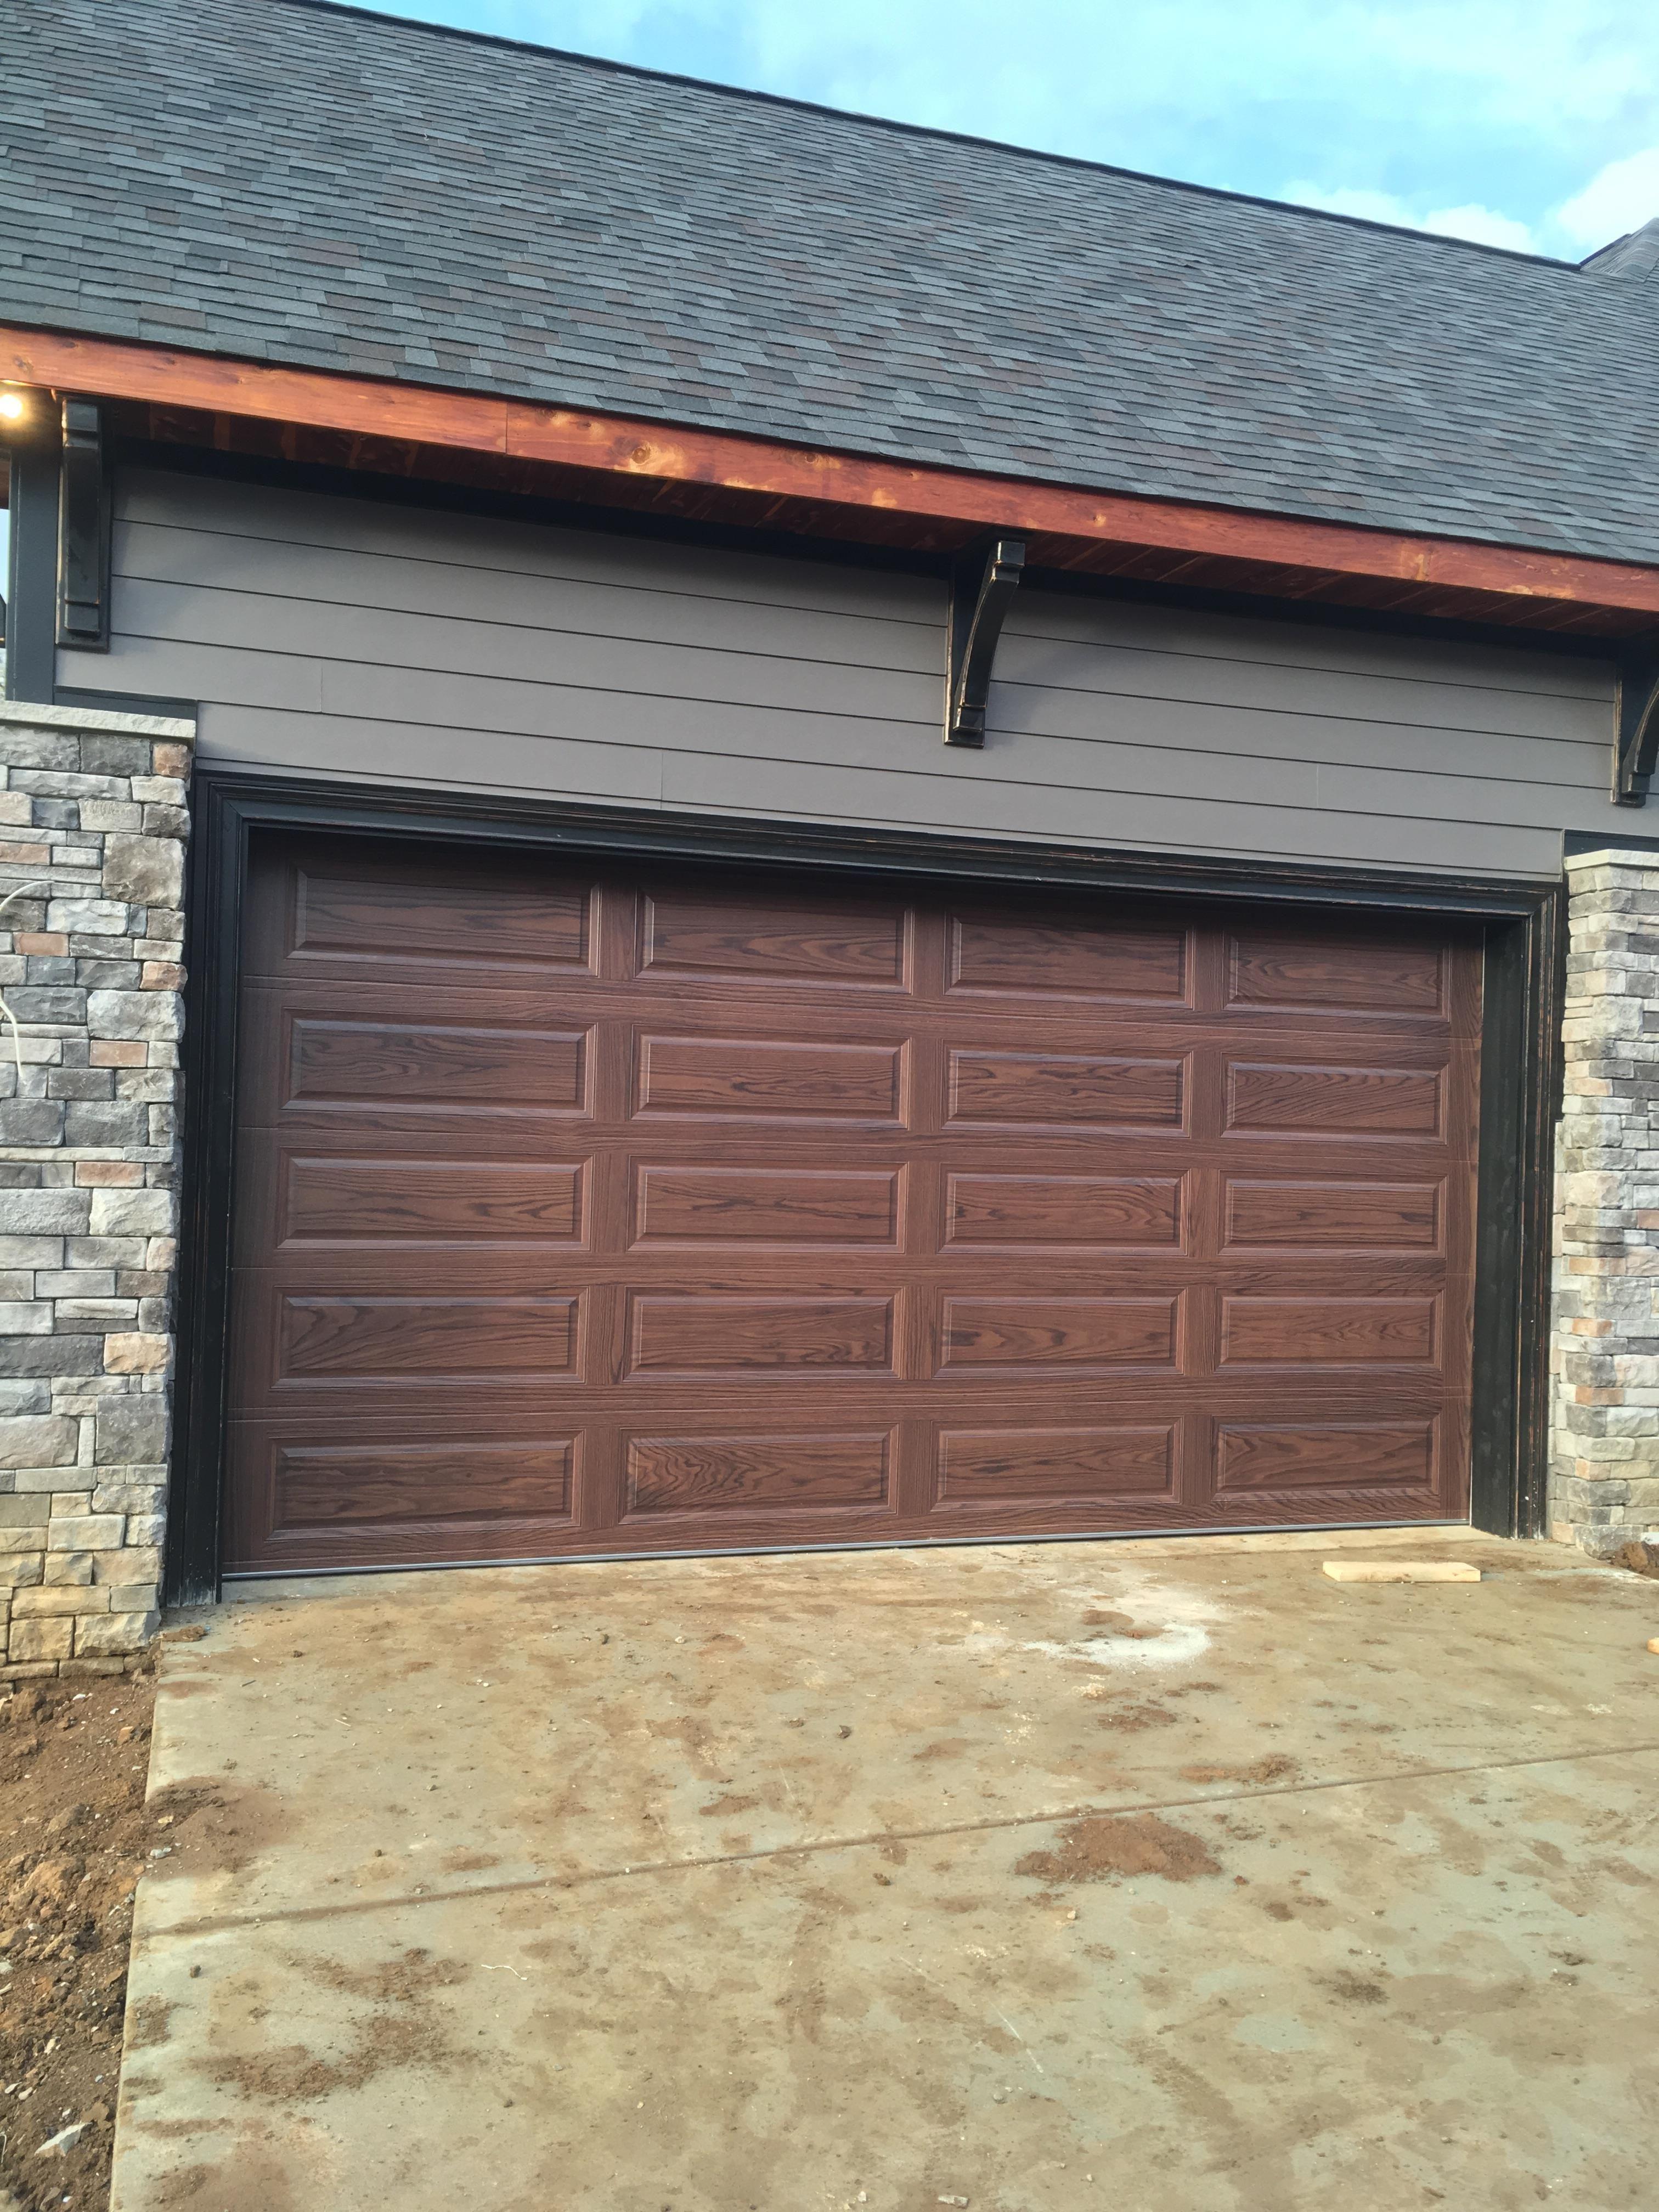 Highland Garage Doors image 4